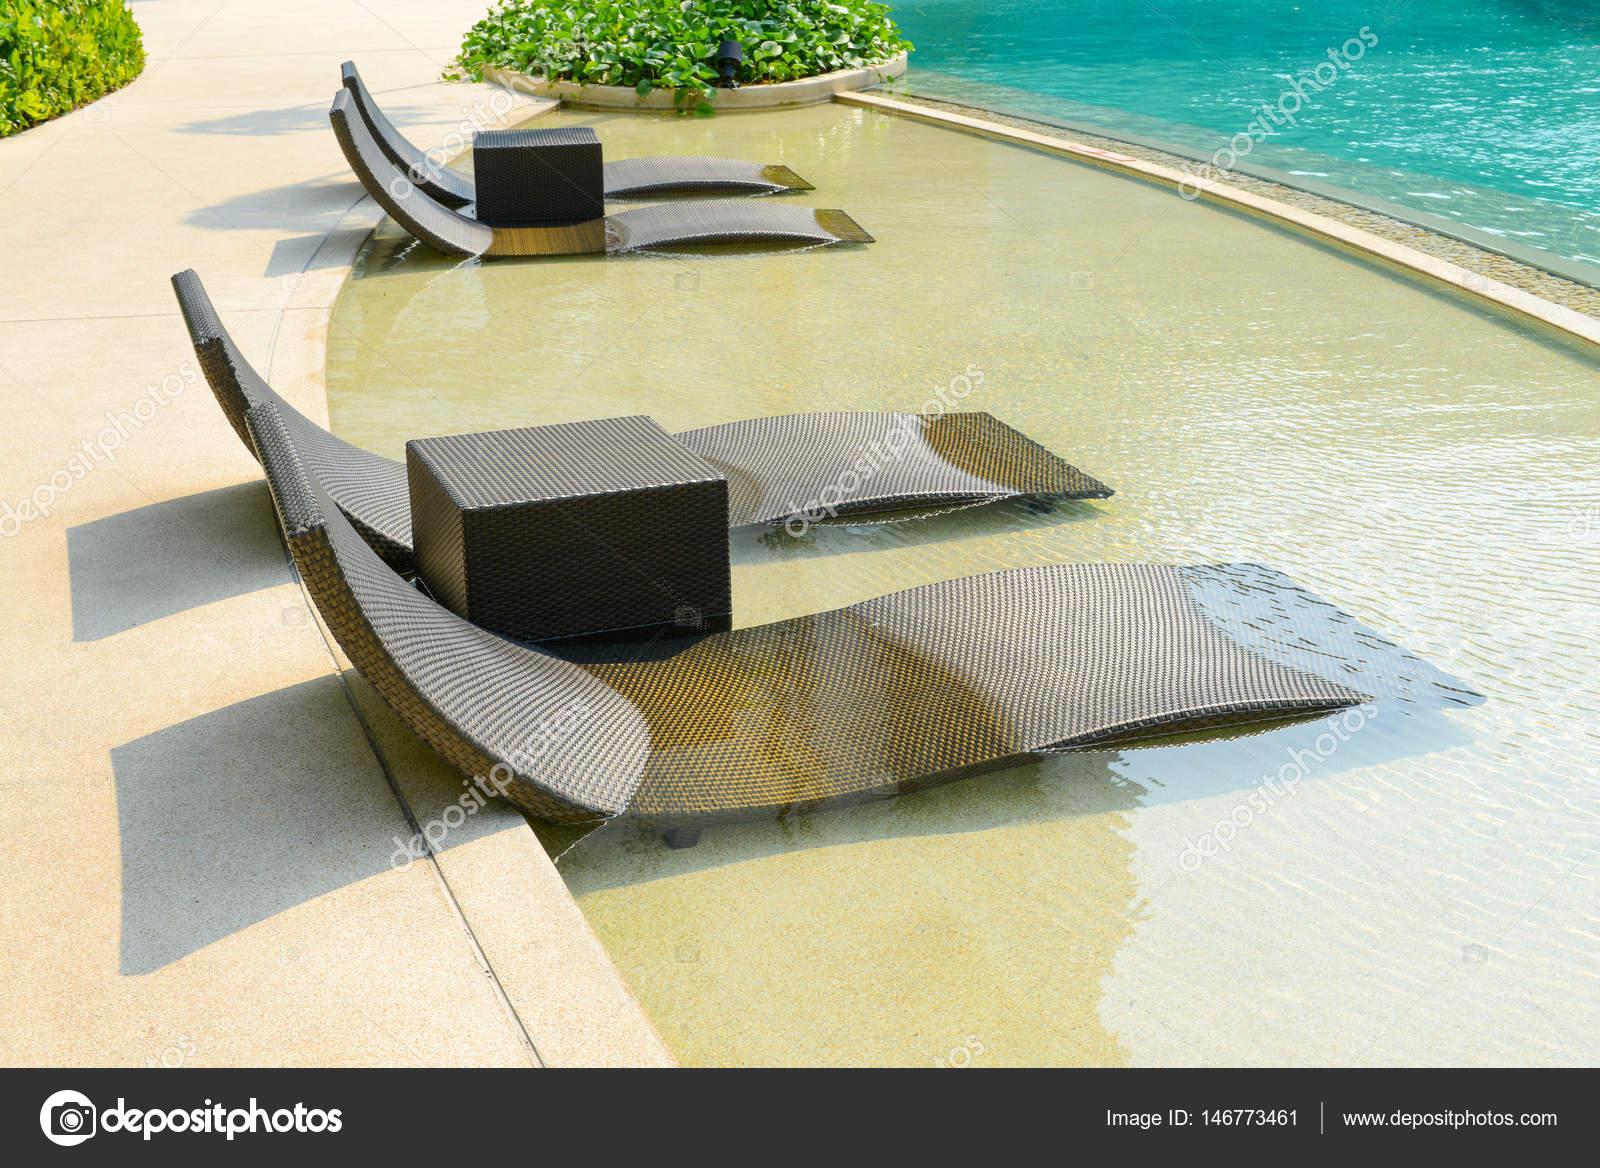 Sedie sdraio piscina piscina in legno sedia sdraio presso for Sedie per piscina